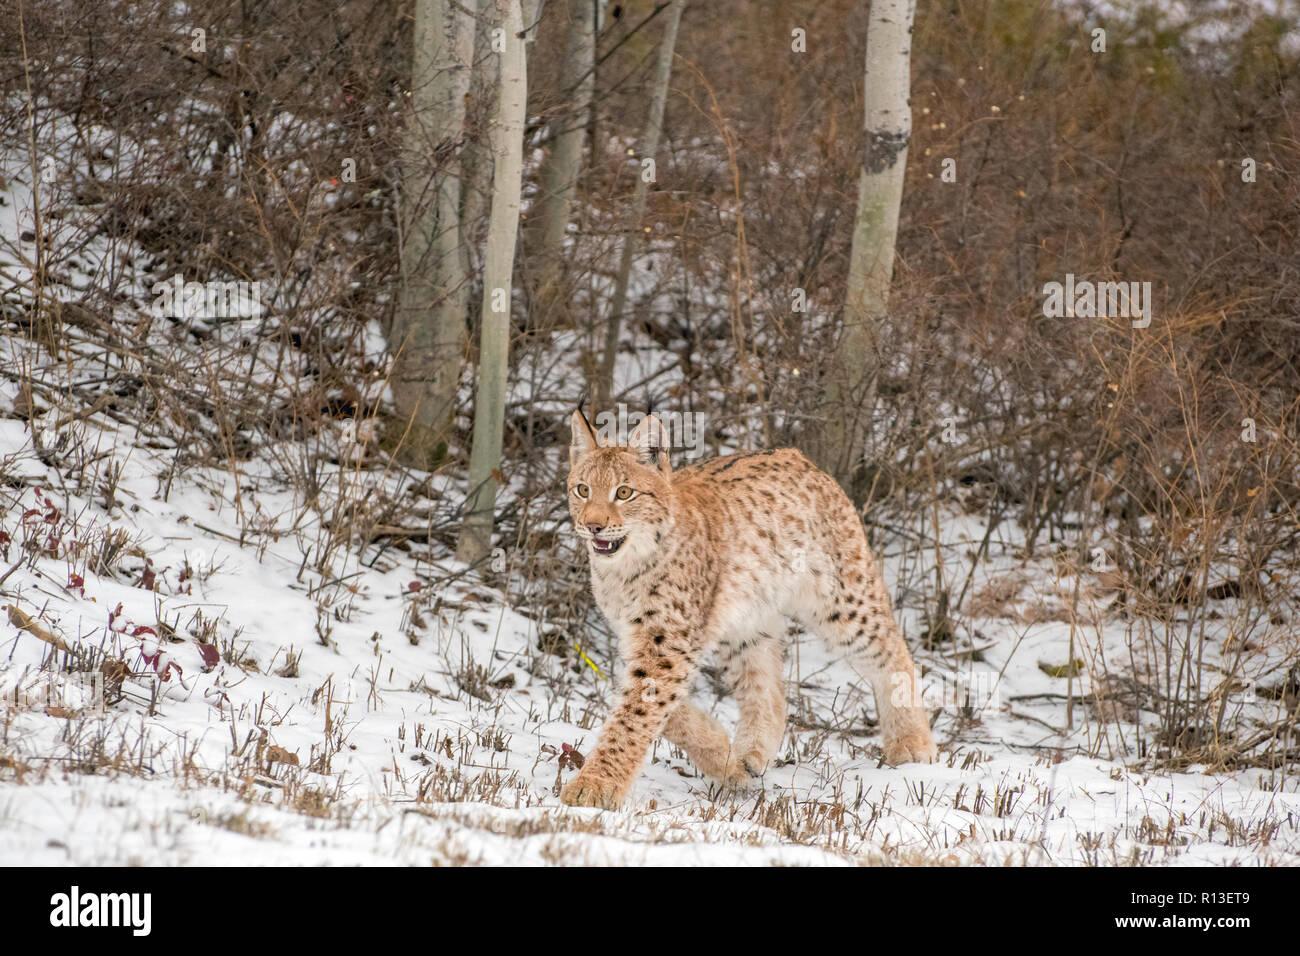 Siberian Lynx Cub Kitten in the Snow 5 - Stock Image